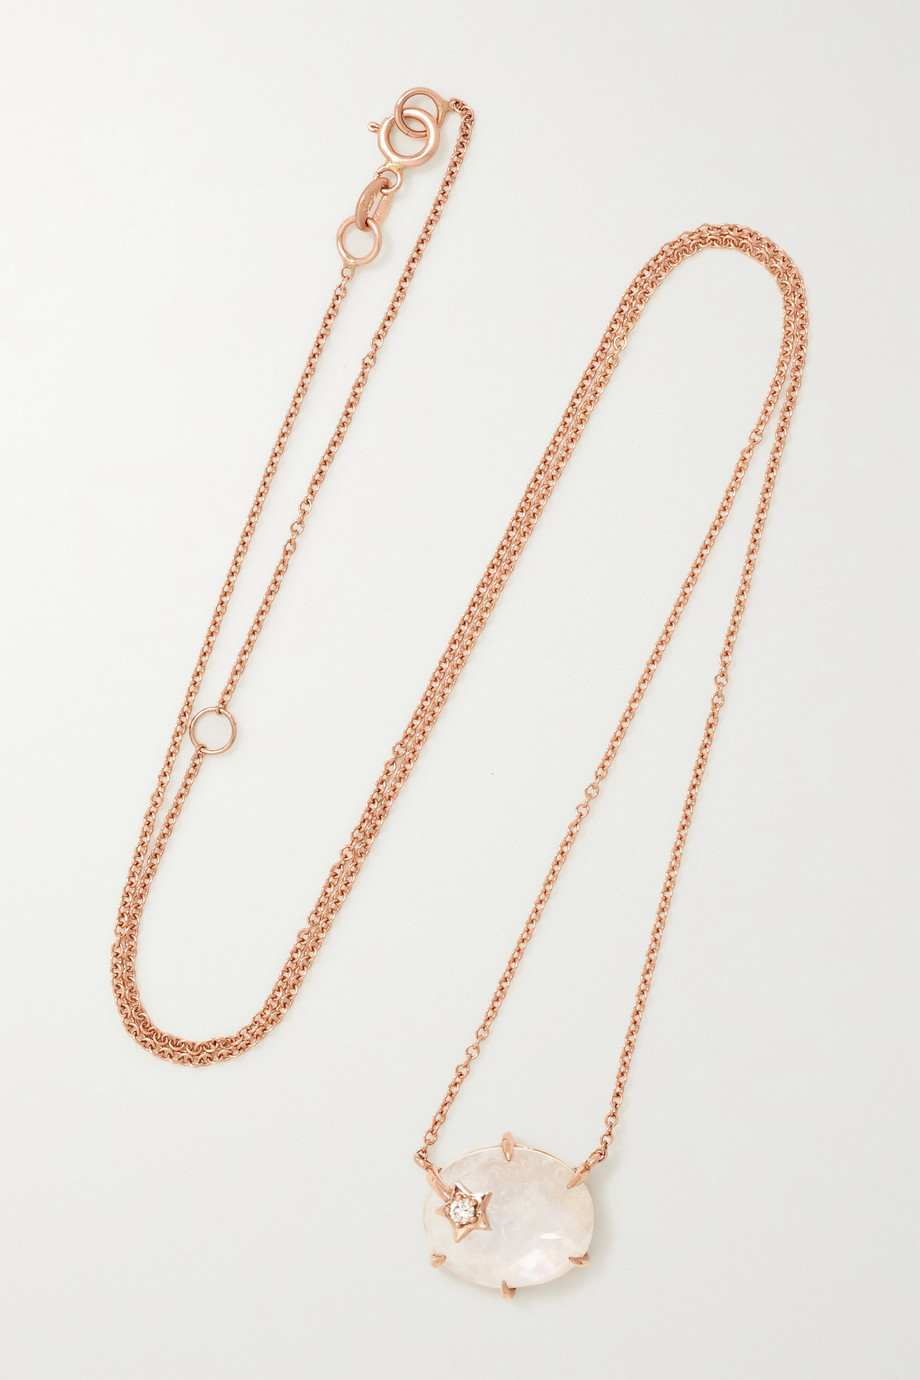 Andrea Fohrman Mini Galaxy 14-karat rose gold, moonstone and diamond necklace